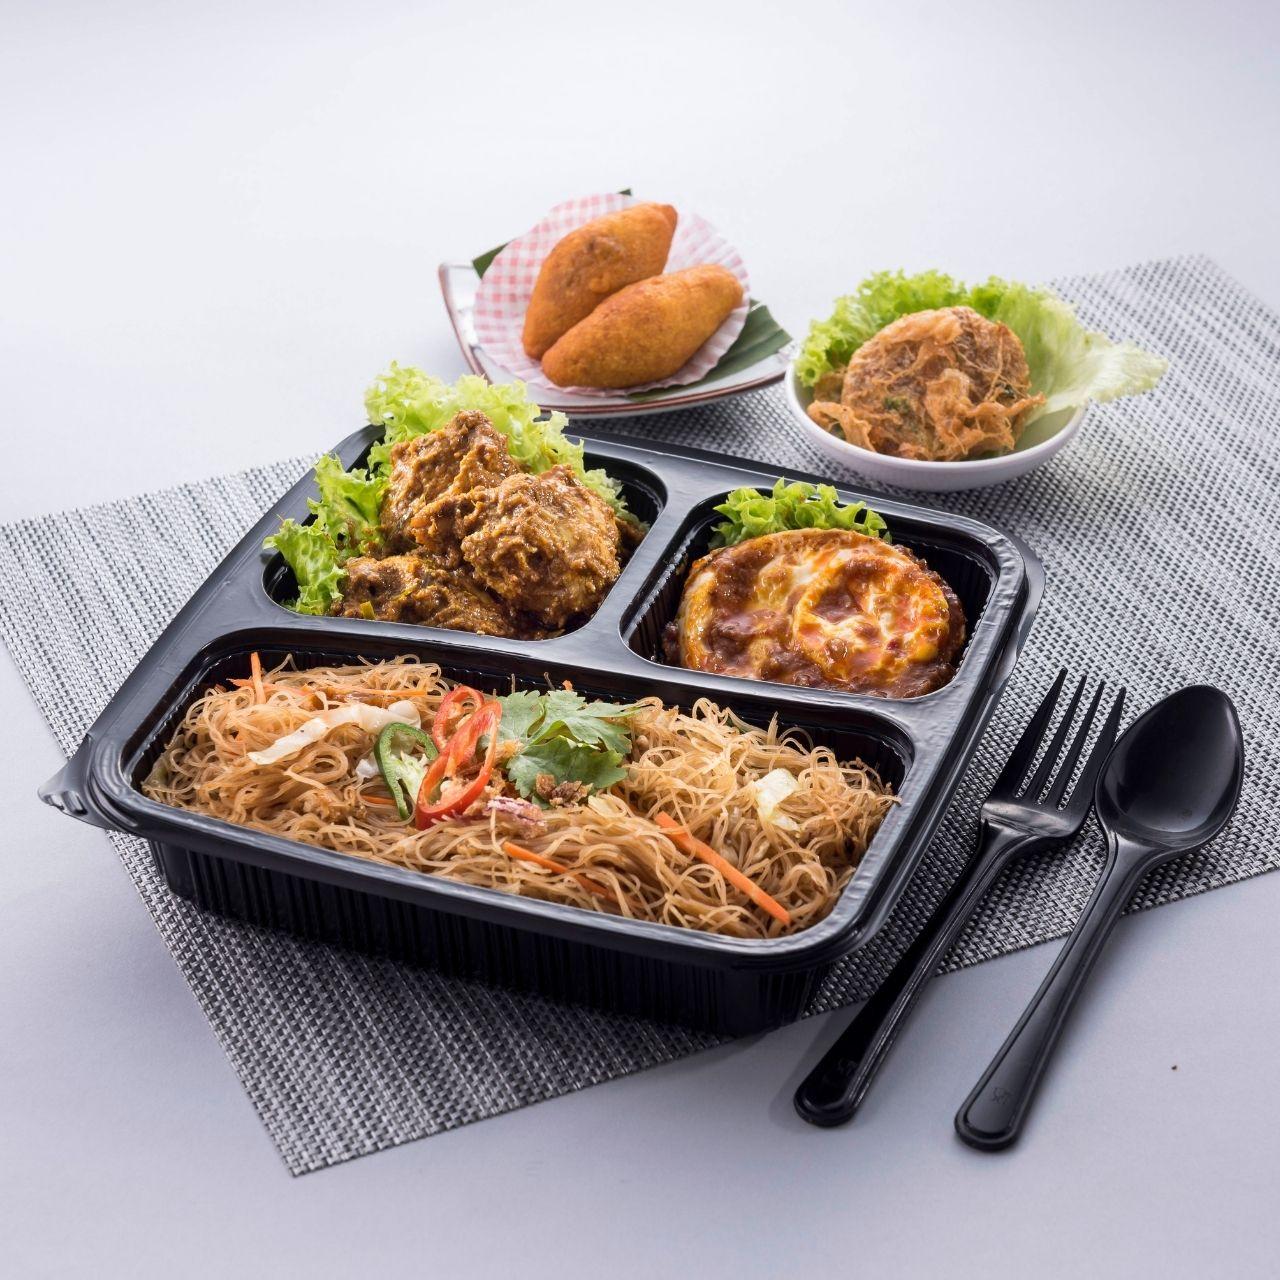 runningmen catering bento box meehoon goreng with rendang chicken